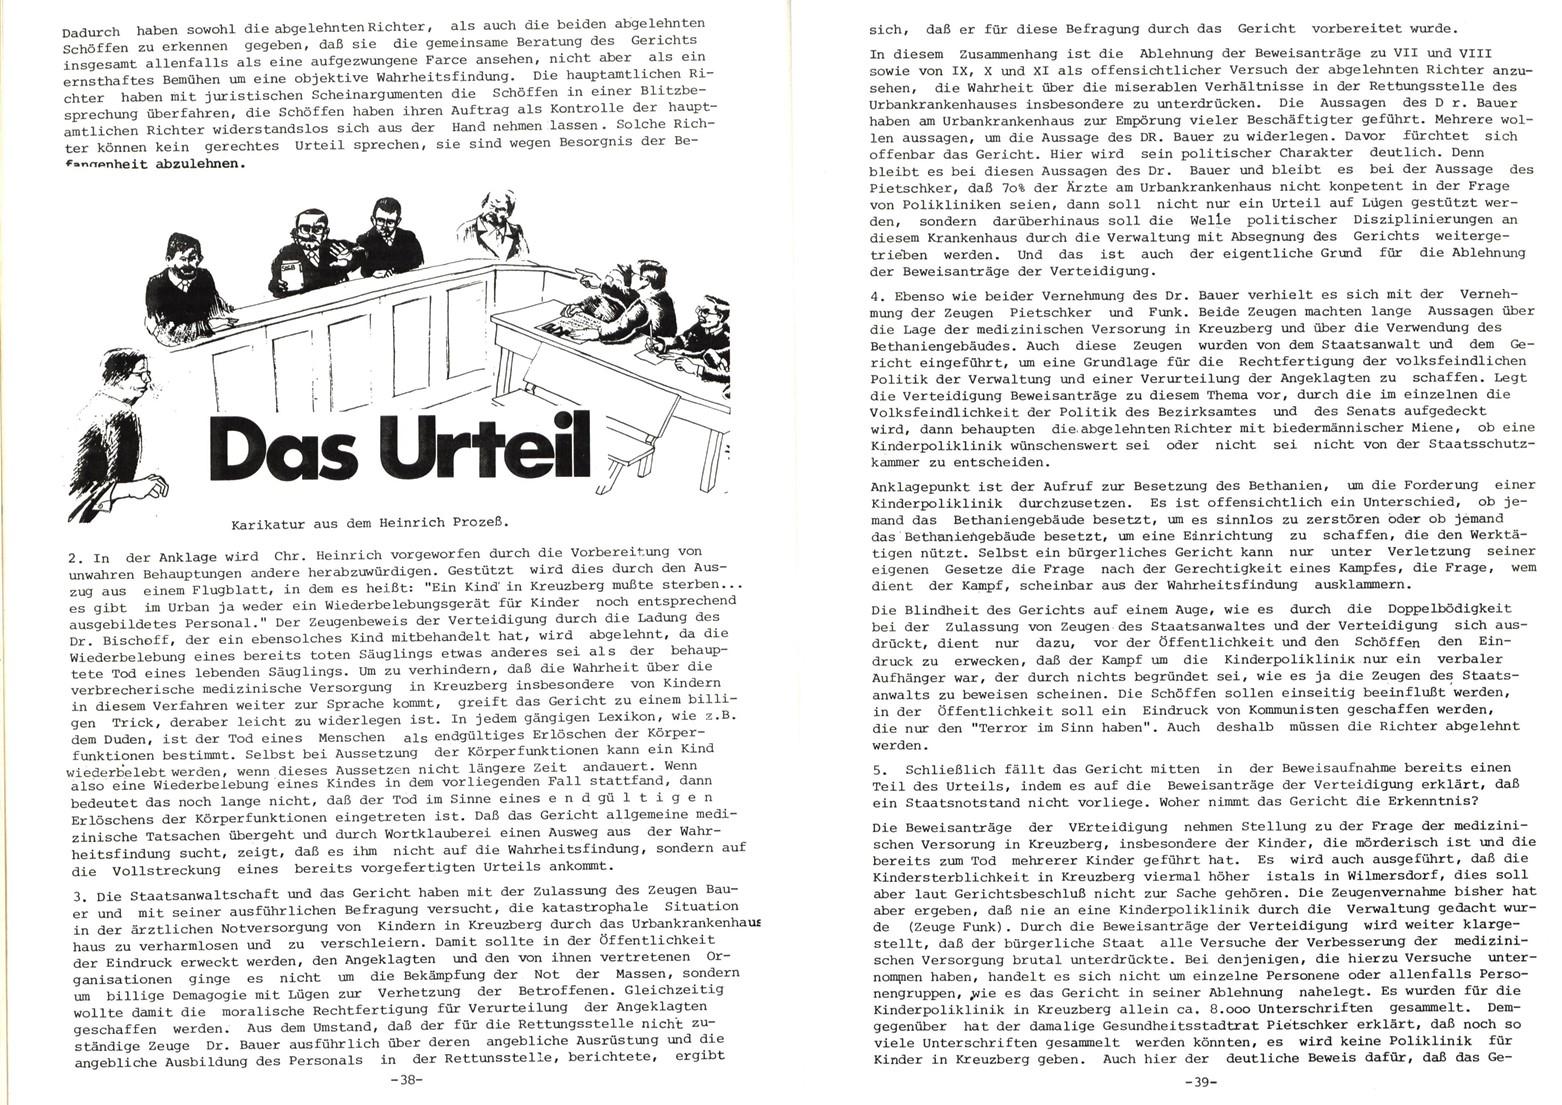 KPDAO_1976_Staatsschutzparagrafen_20